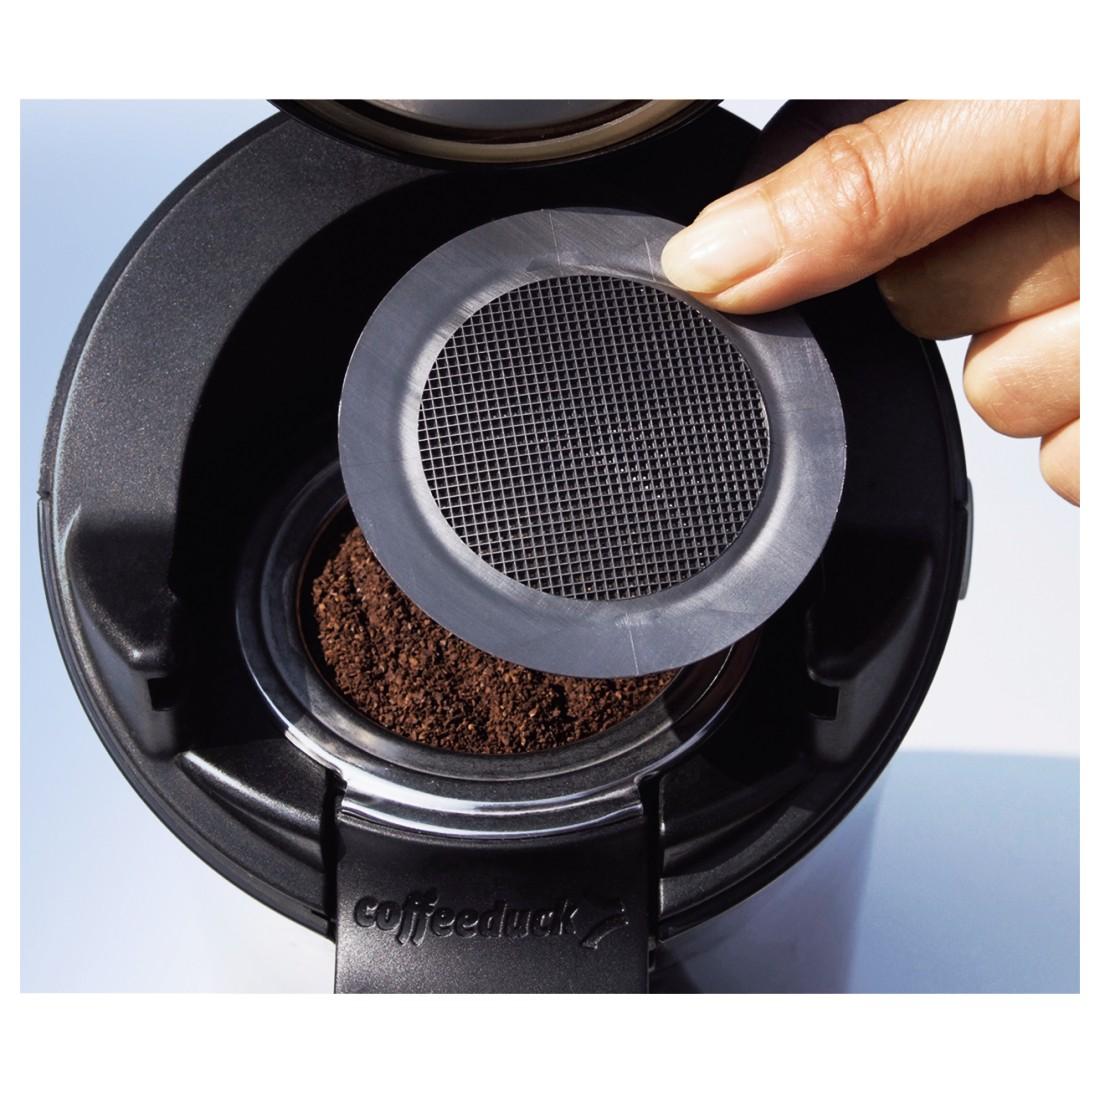 xavax die starke marke im haushalt 00111058 xavax kaffeefilter coffeeduck f r. Black Bedroom Furniture Sets. Home Design Ideas